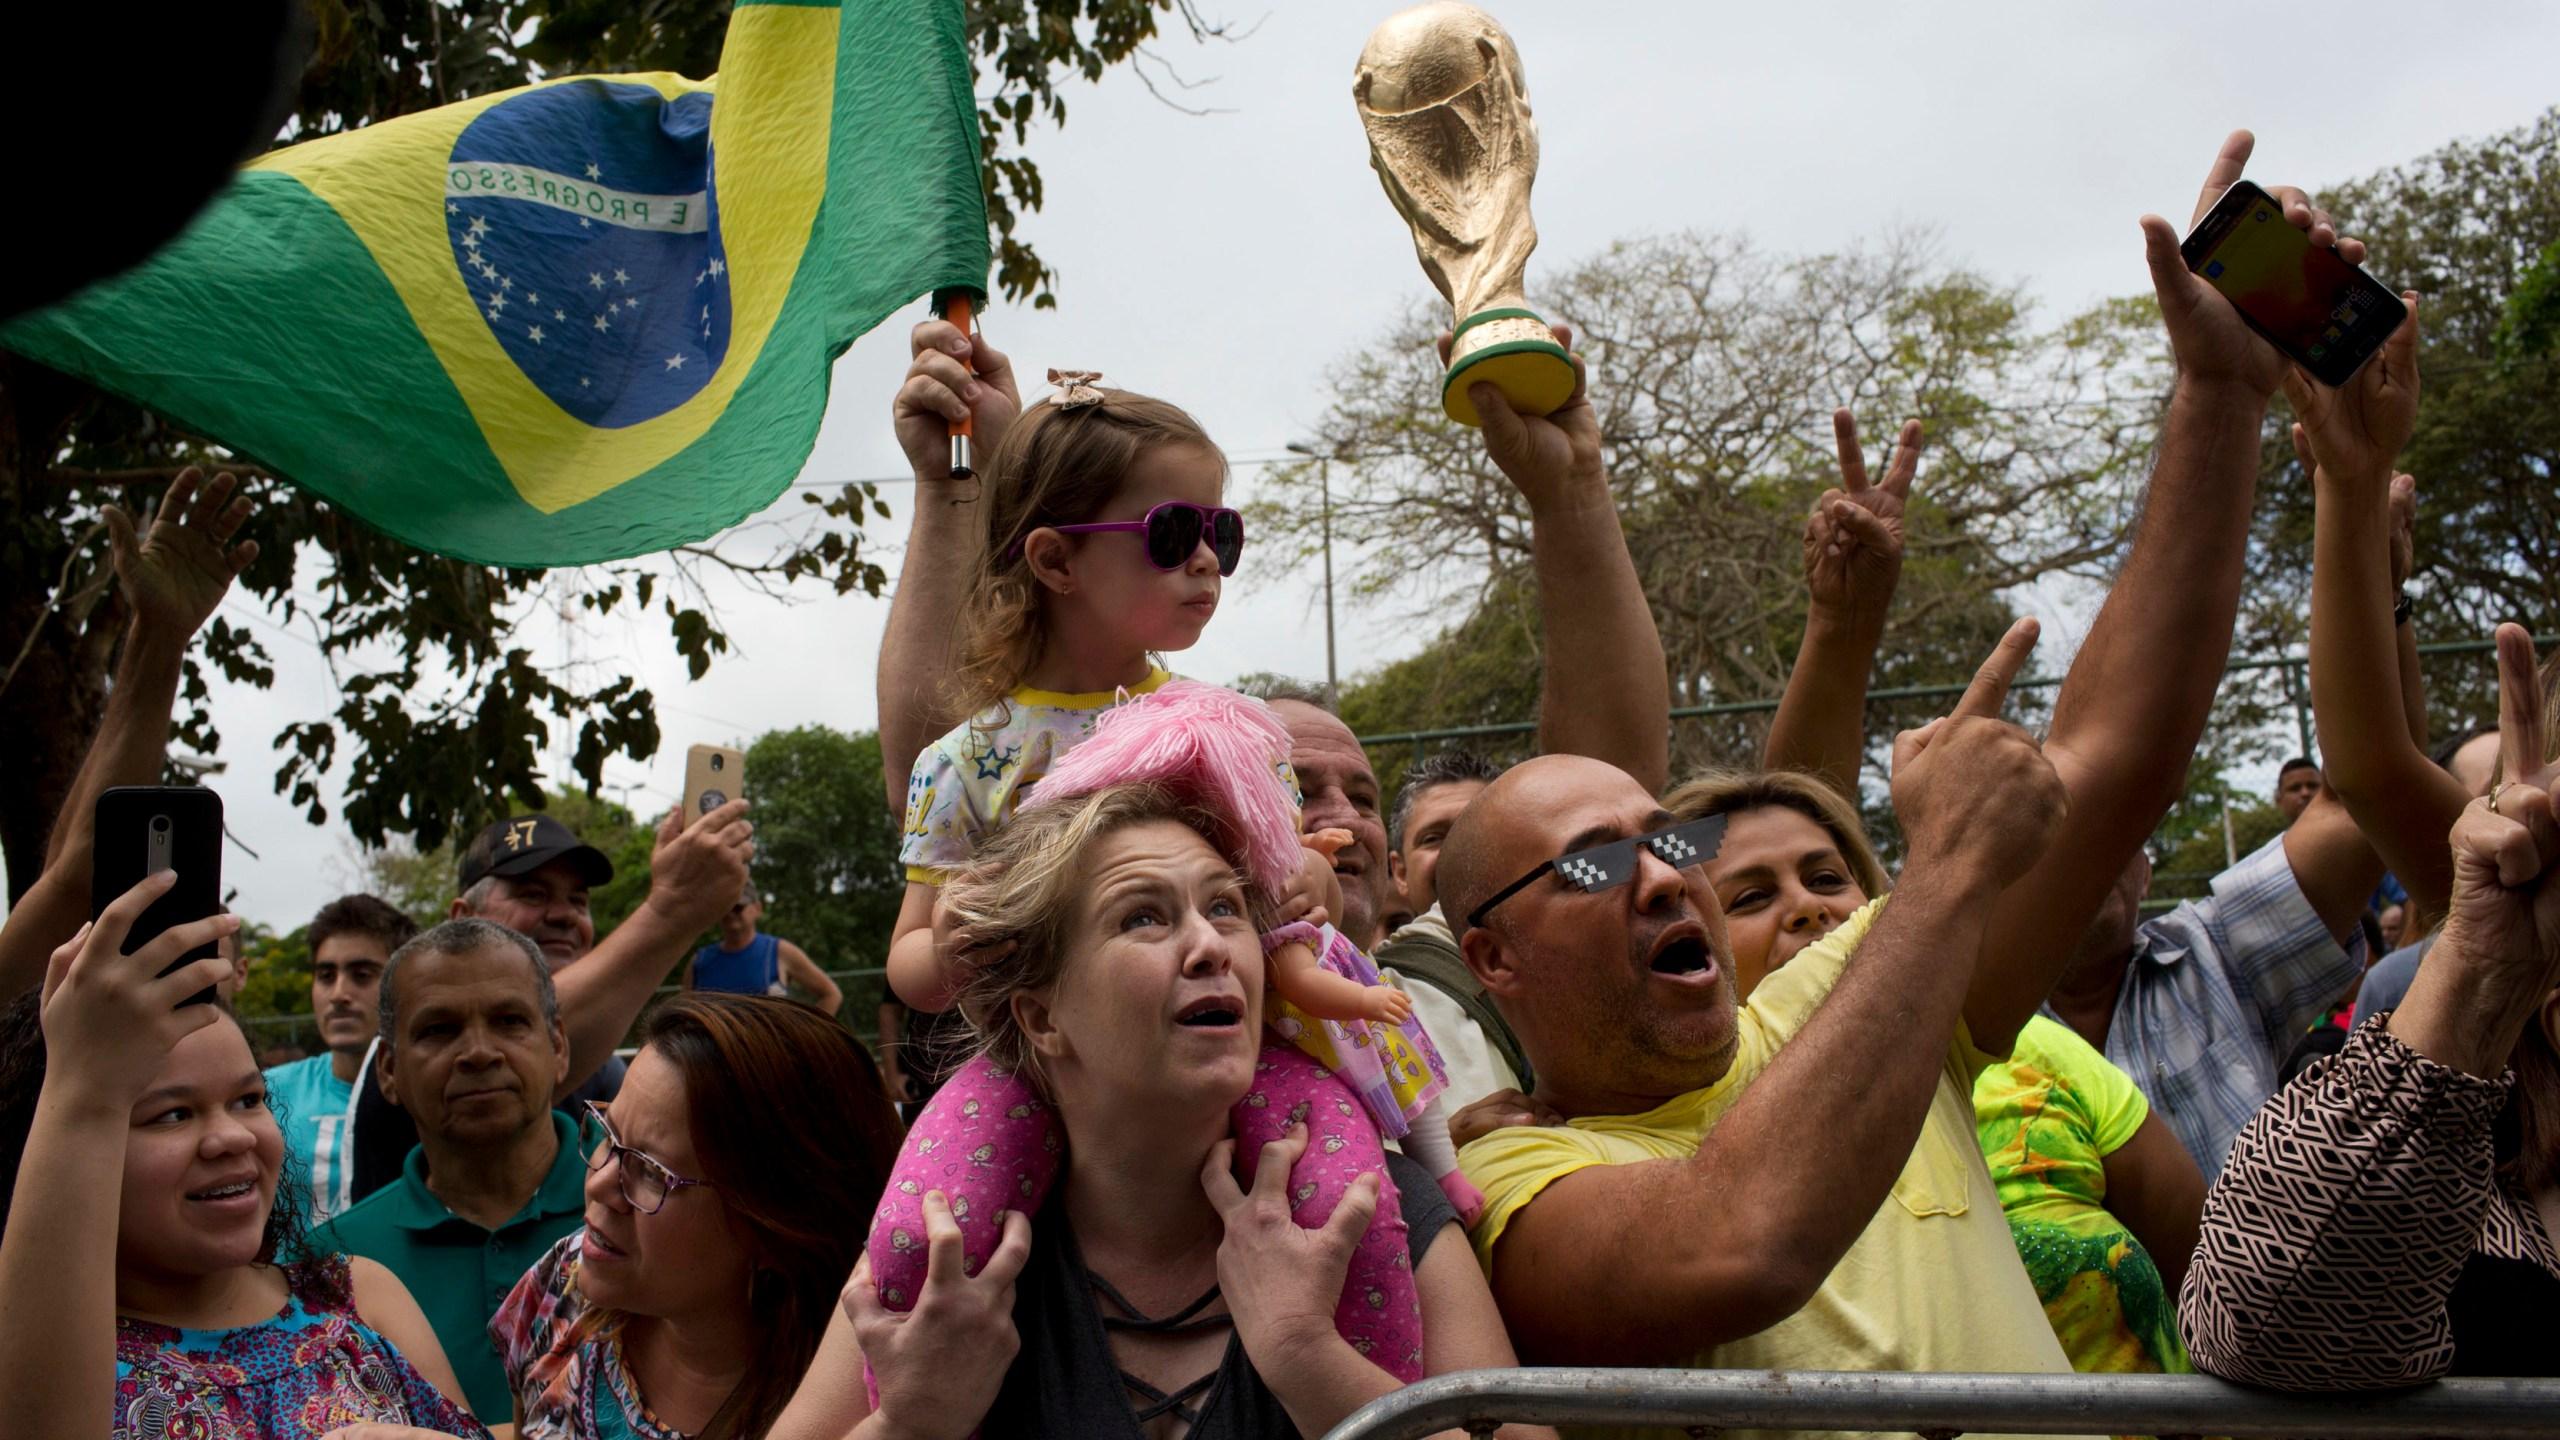 Brazil_Elections_15449-159532.jpg49004798